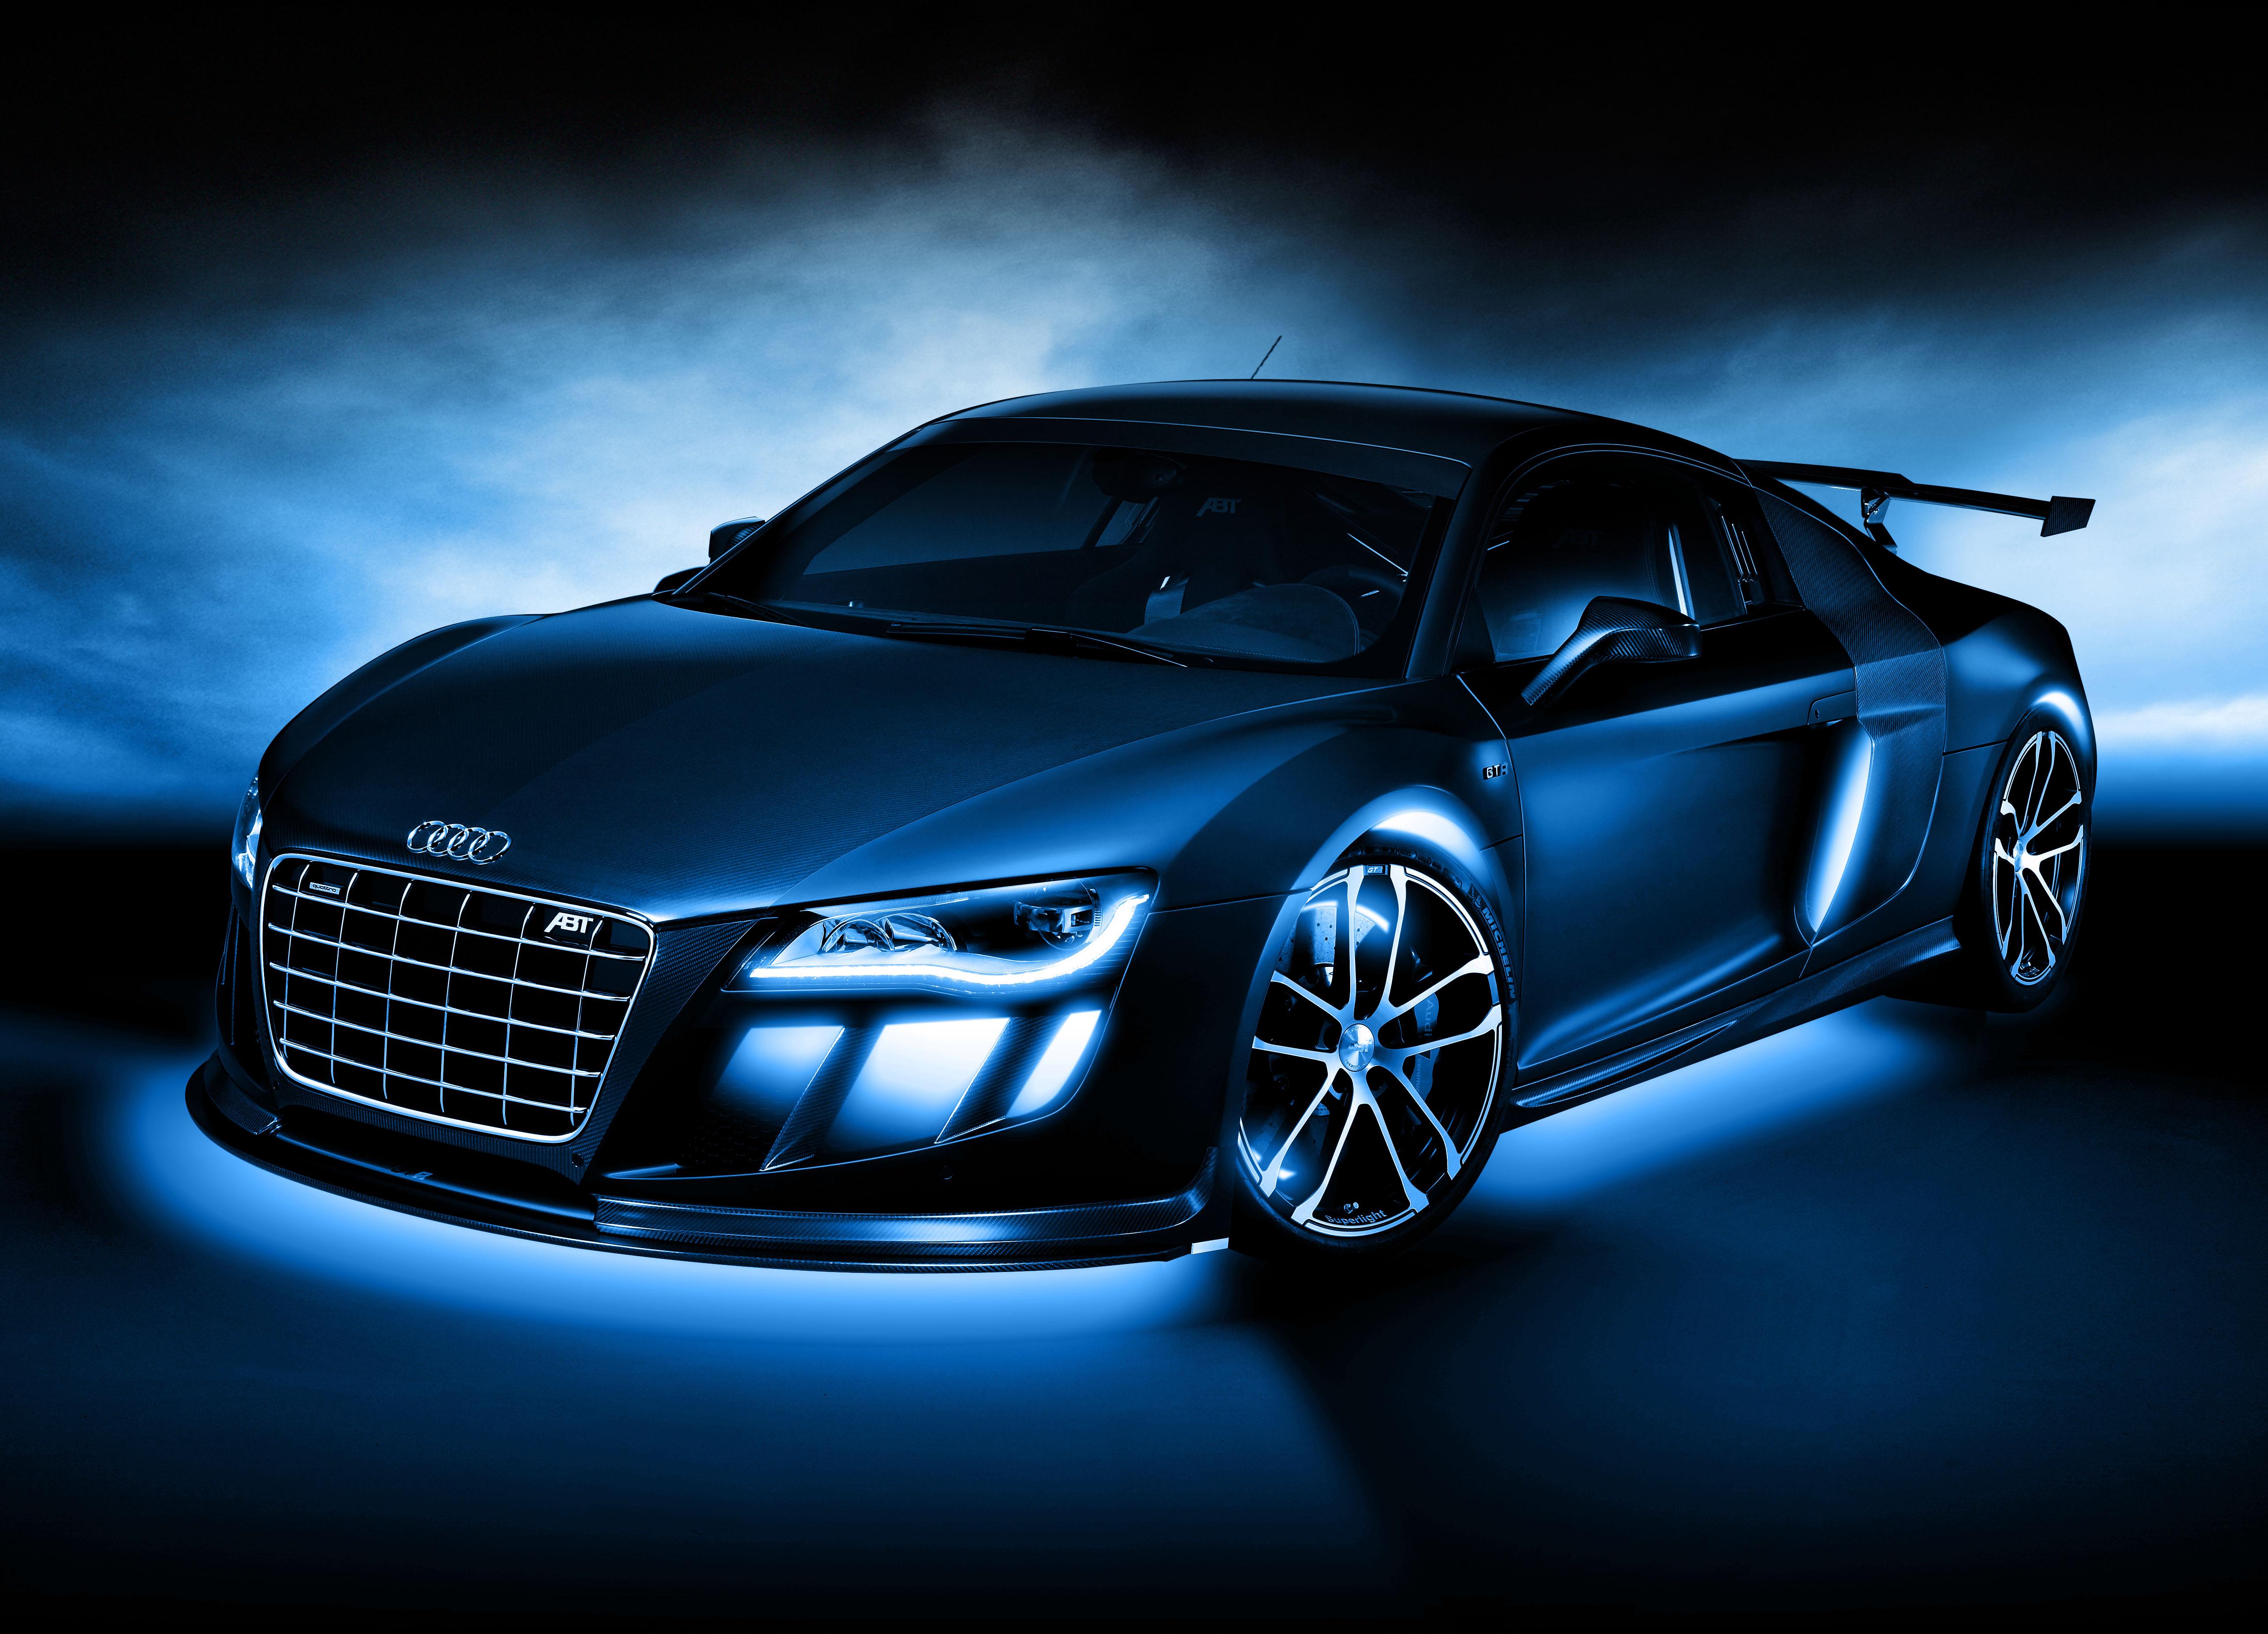 Car Lights Car Bottom Led Light 2050594 Hd Wallpaper